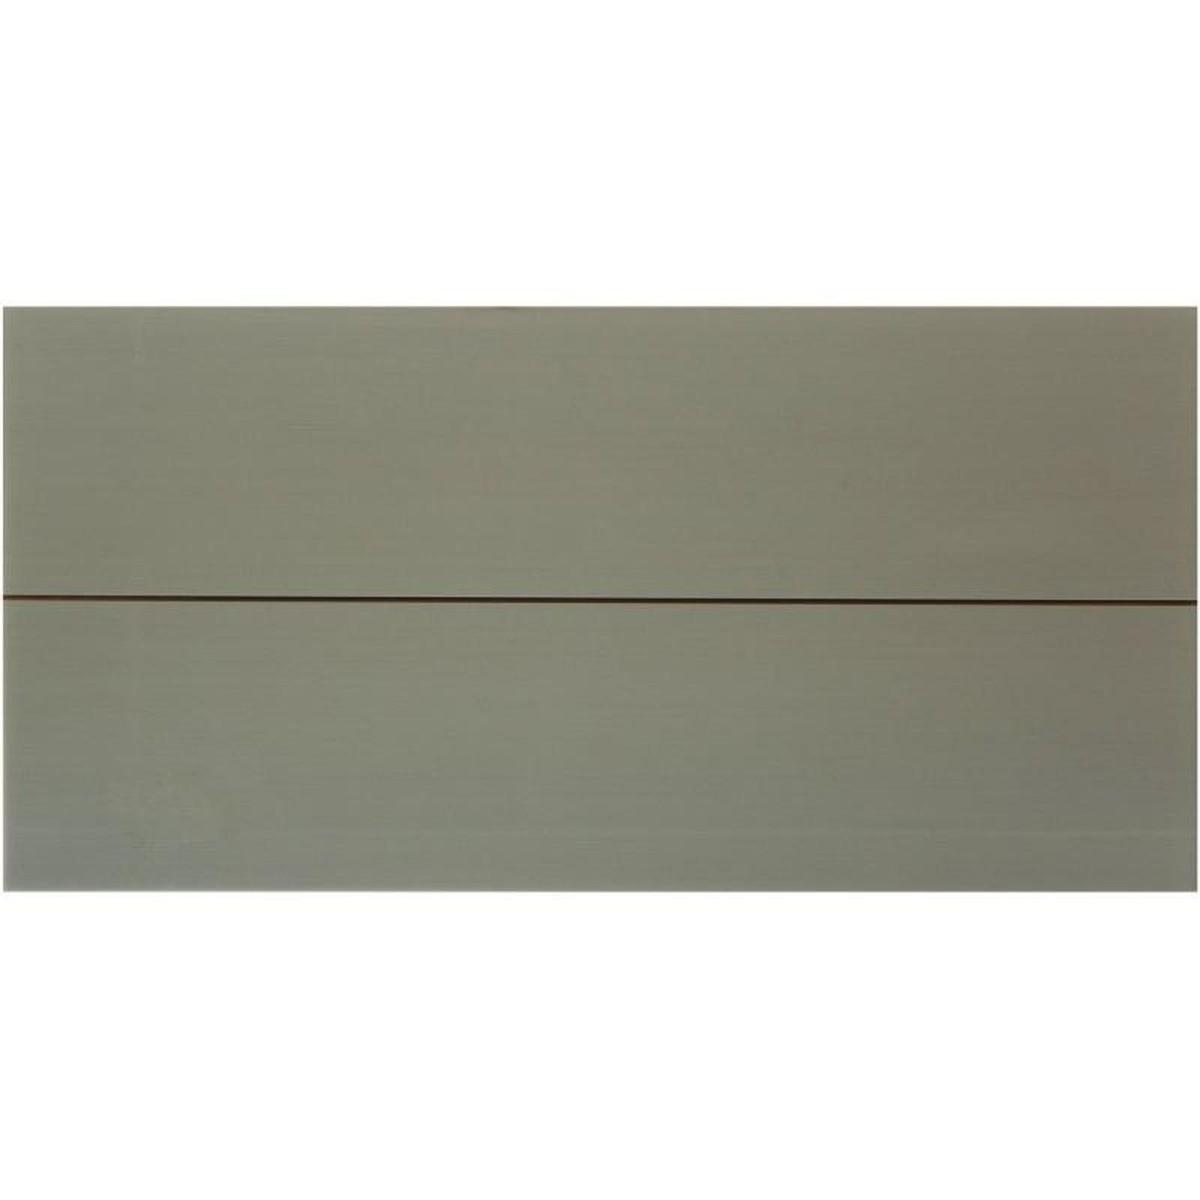 Декор «Фрэска 2» 20х40 см цвет белый